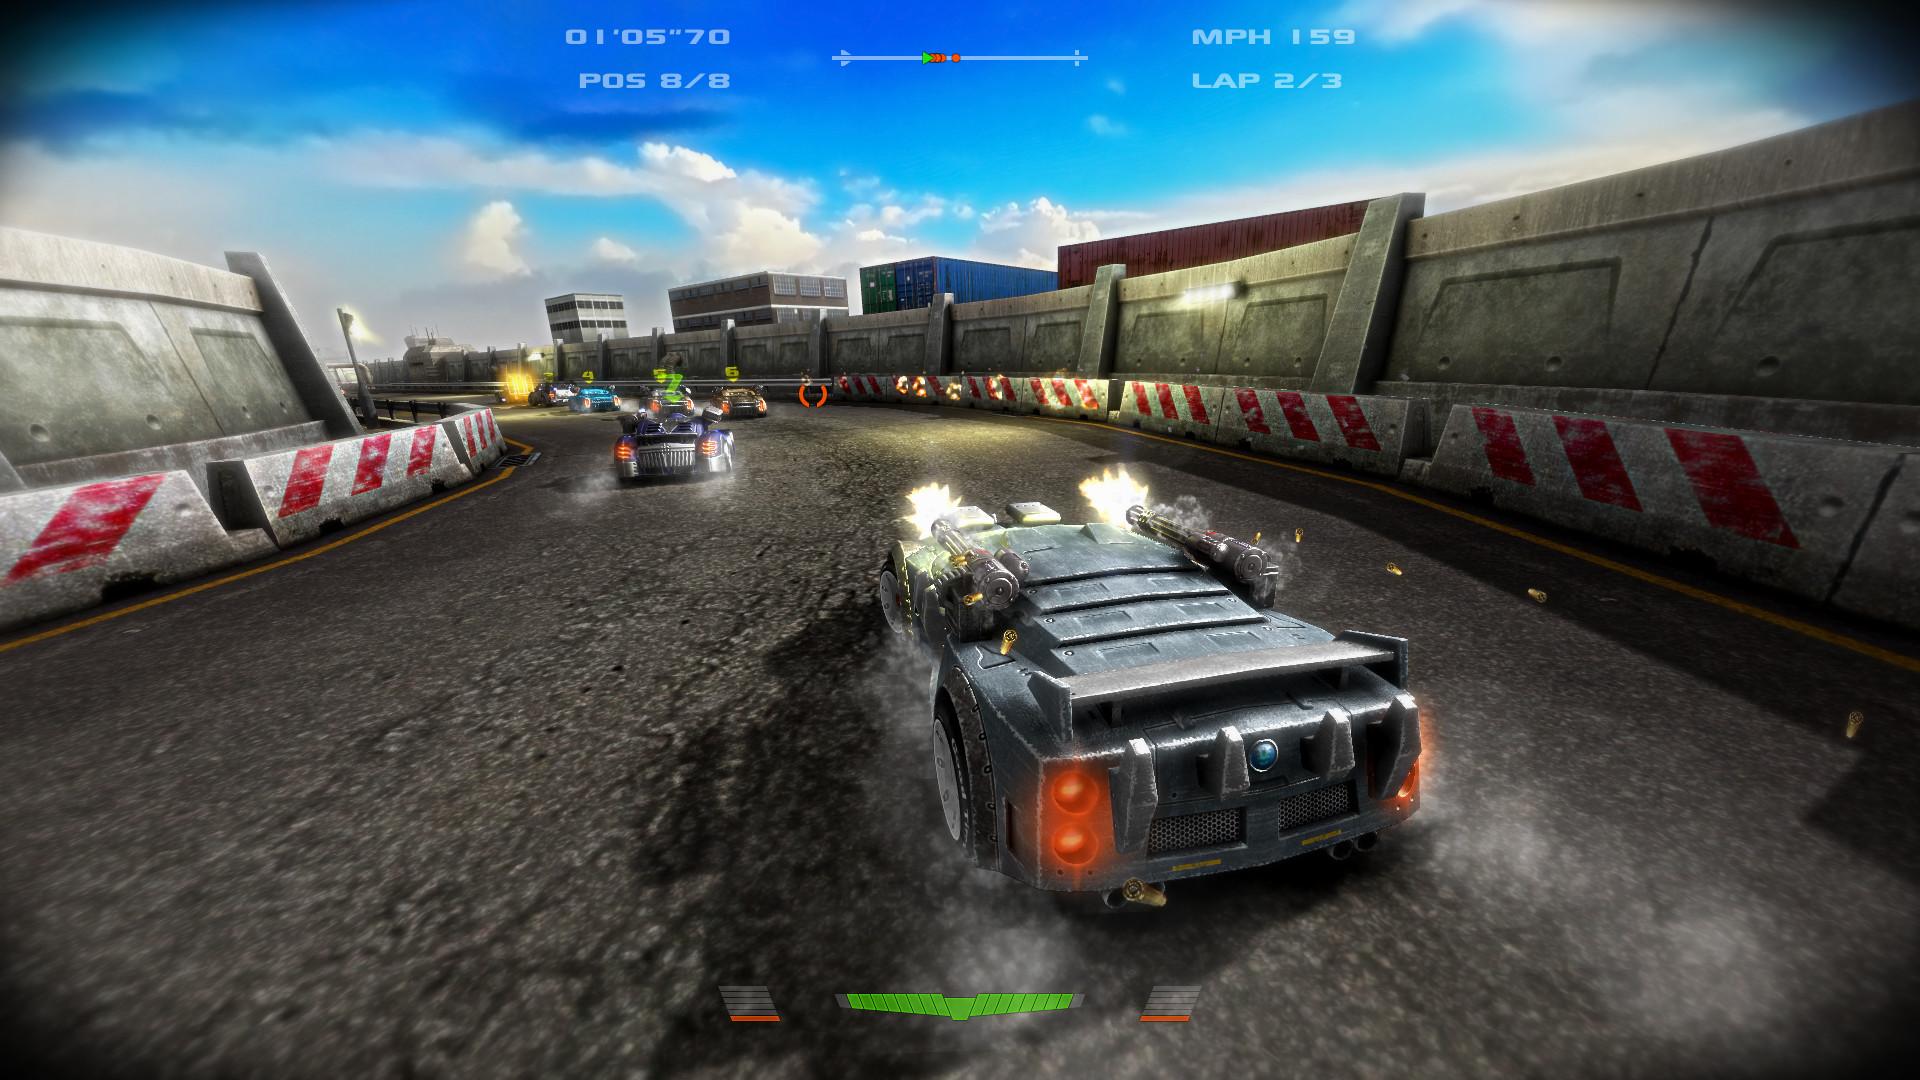 Battle Riders - Indie Game Reviews 2017 Steam Screenshot